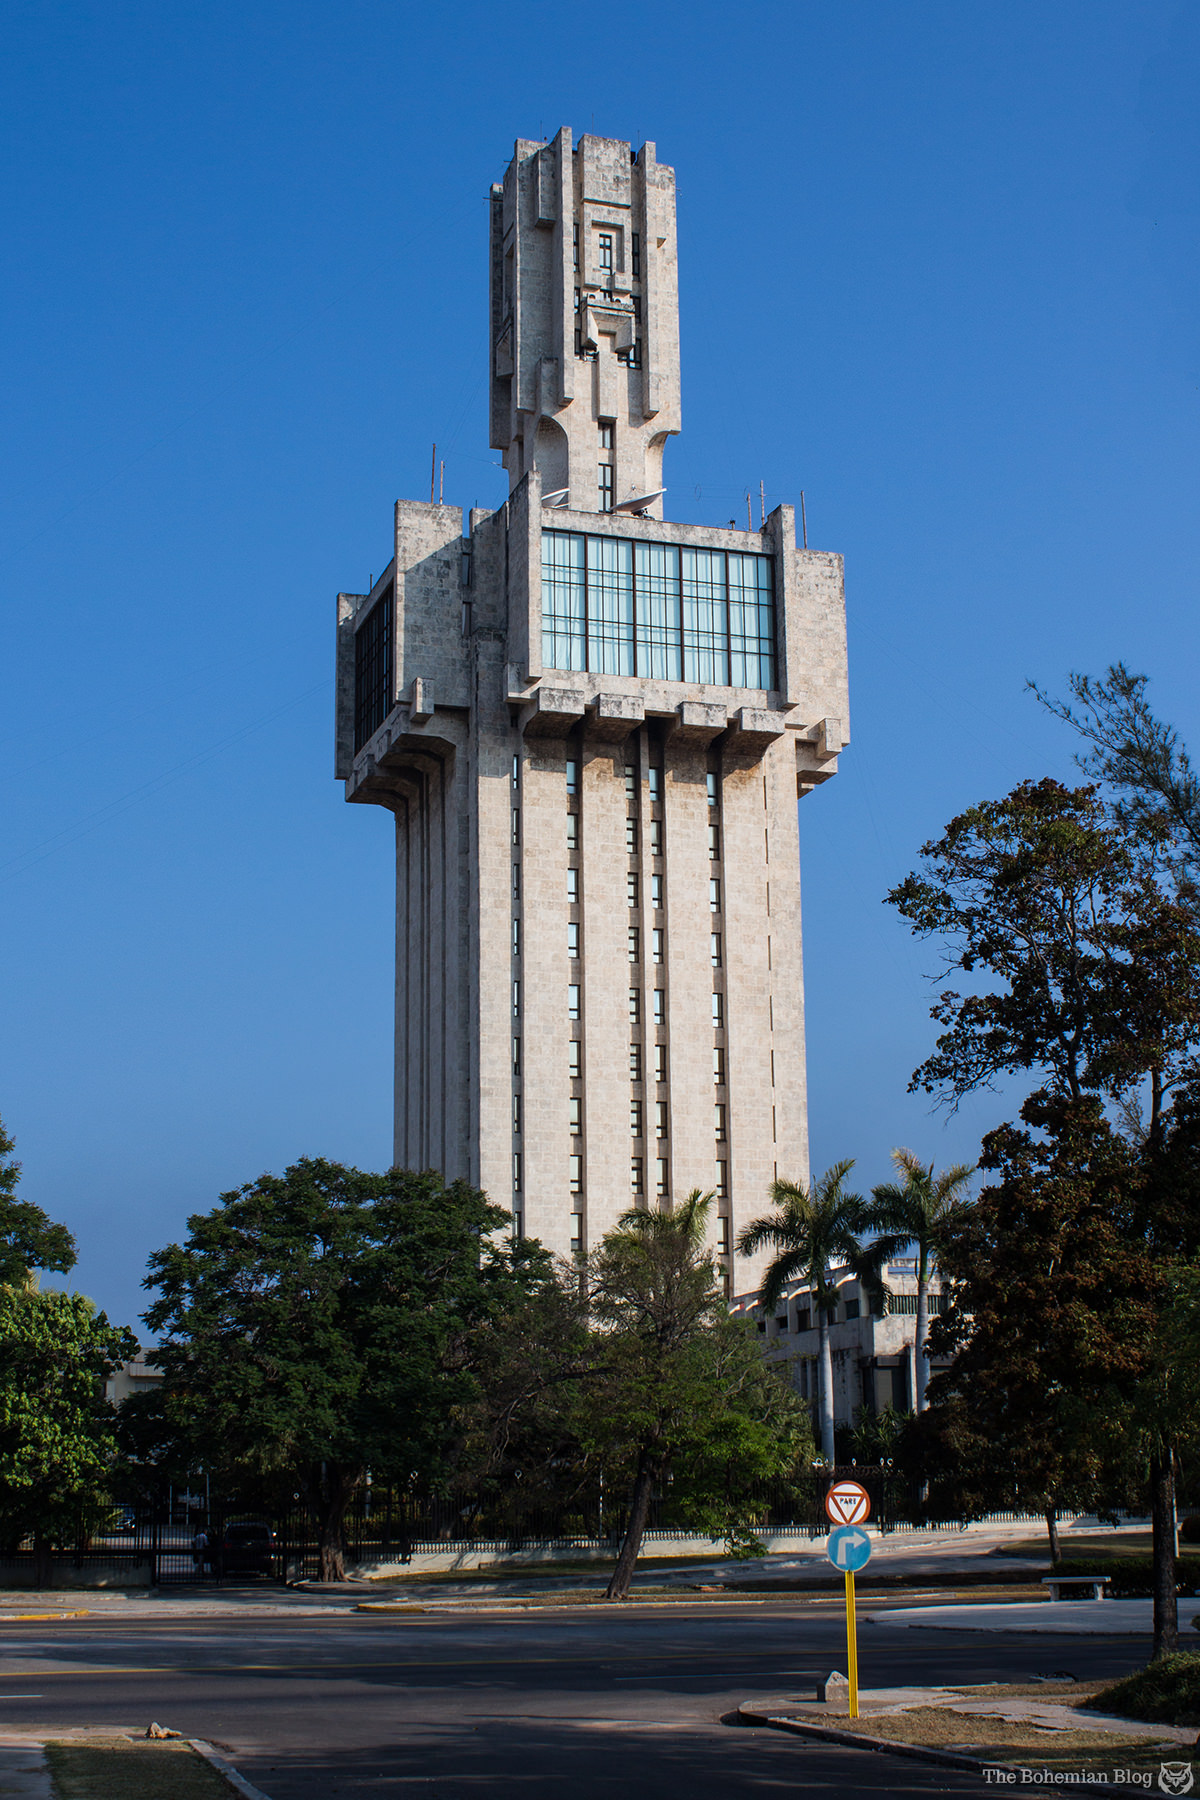 The Russian Embassy in Havana. Architect: Aleksandr Rochegov, 1985.